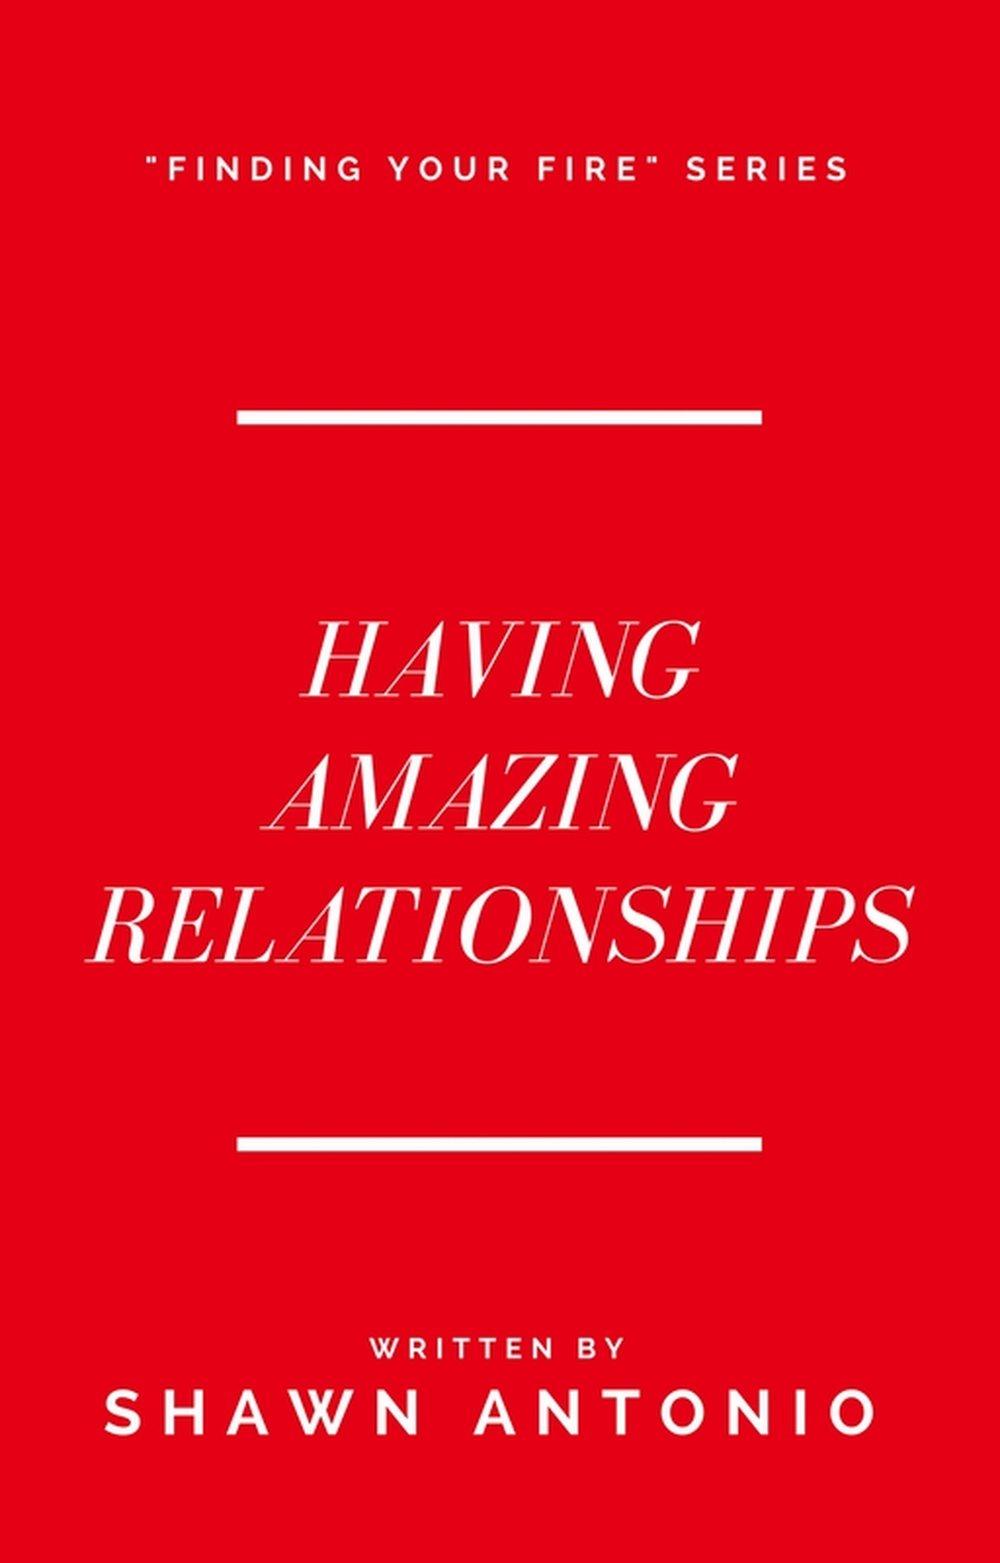 Having Amazing Relationships PRINT.jpg